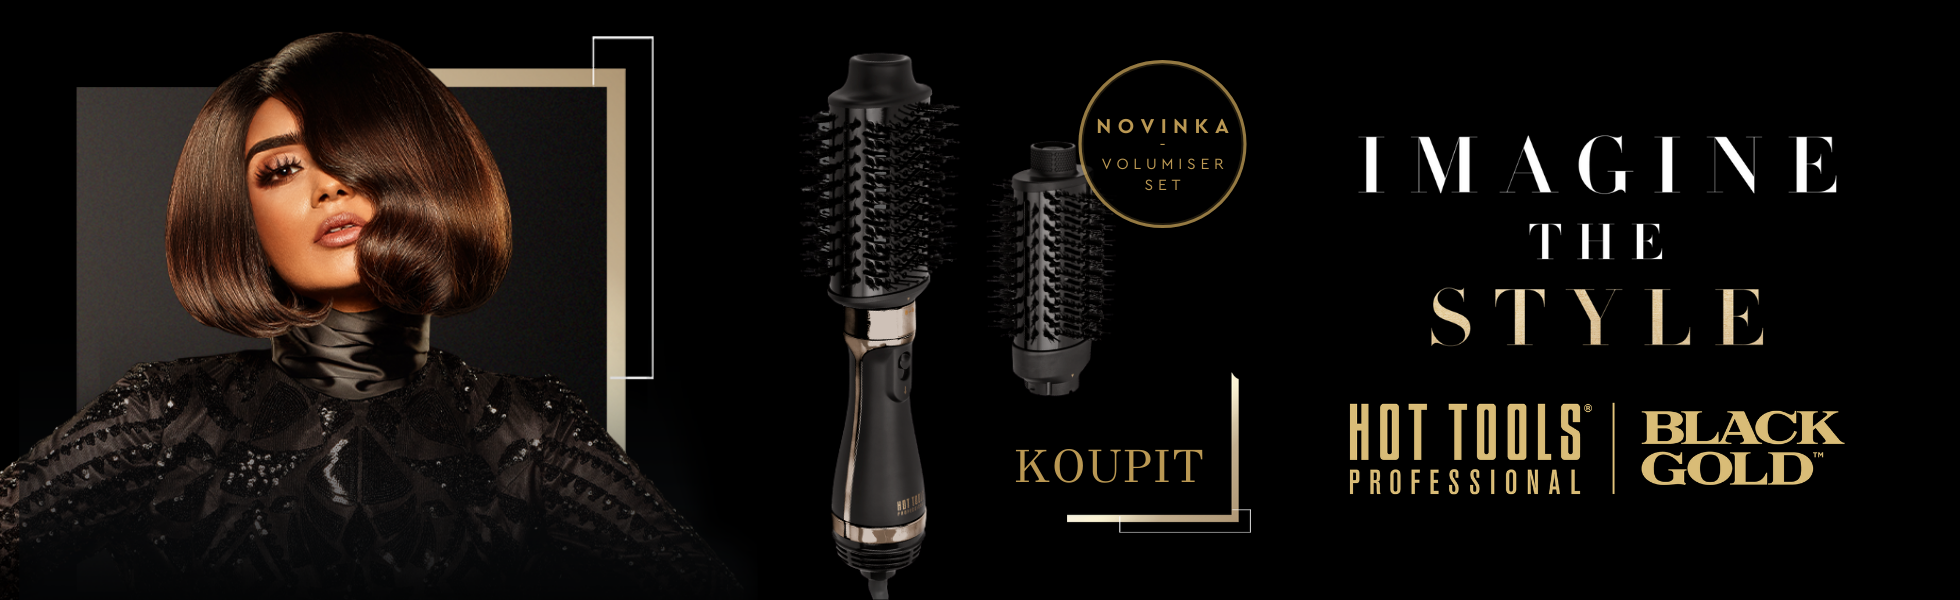 Hot tools novinka Volumiser set